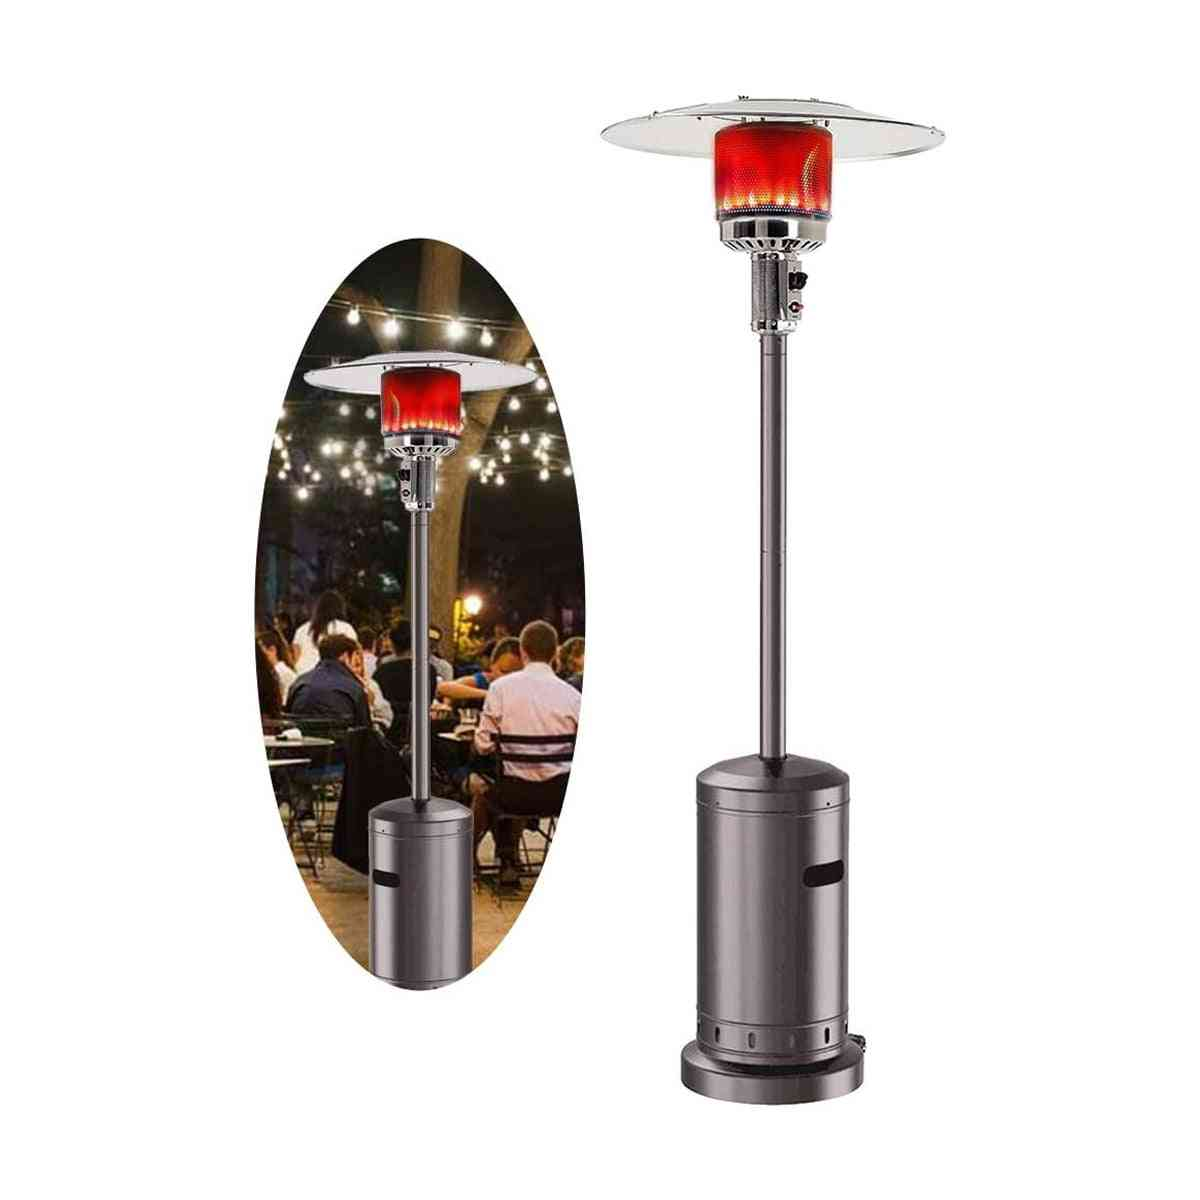 Liquid Propane Gas Powder Stove Floorstanding Umbrella Air Warmer For Garden Outdoor